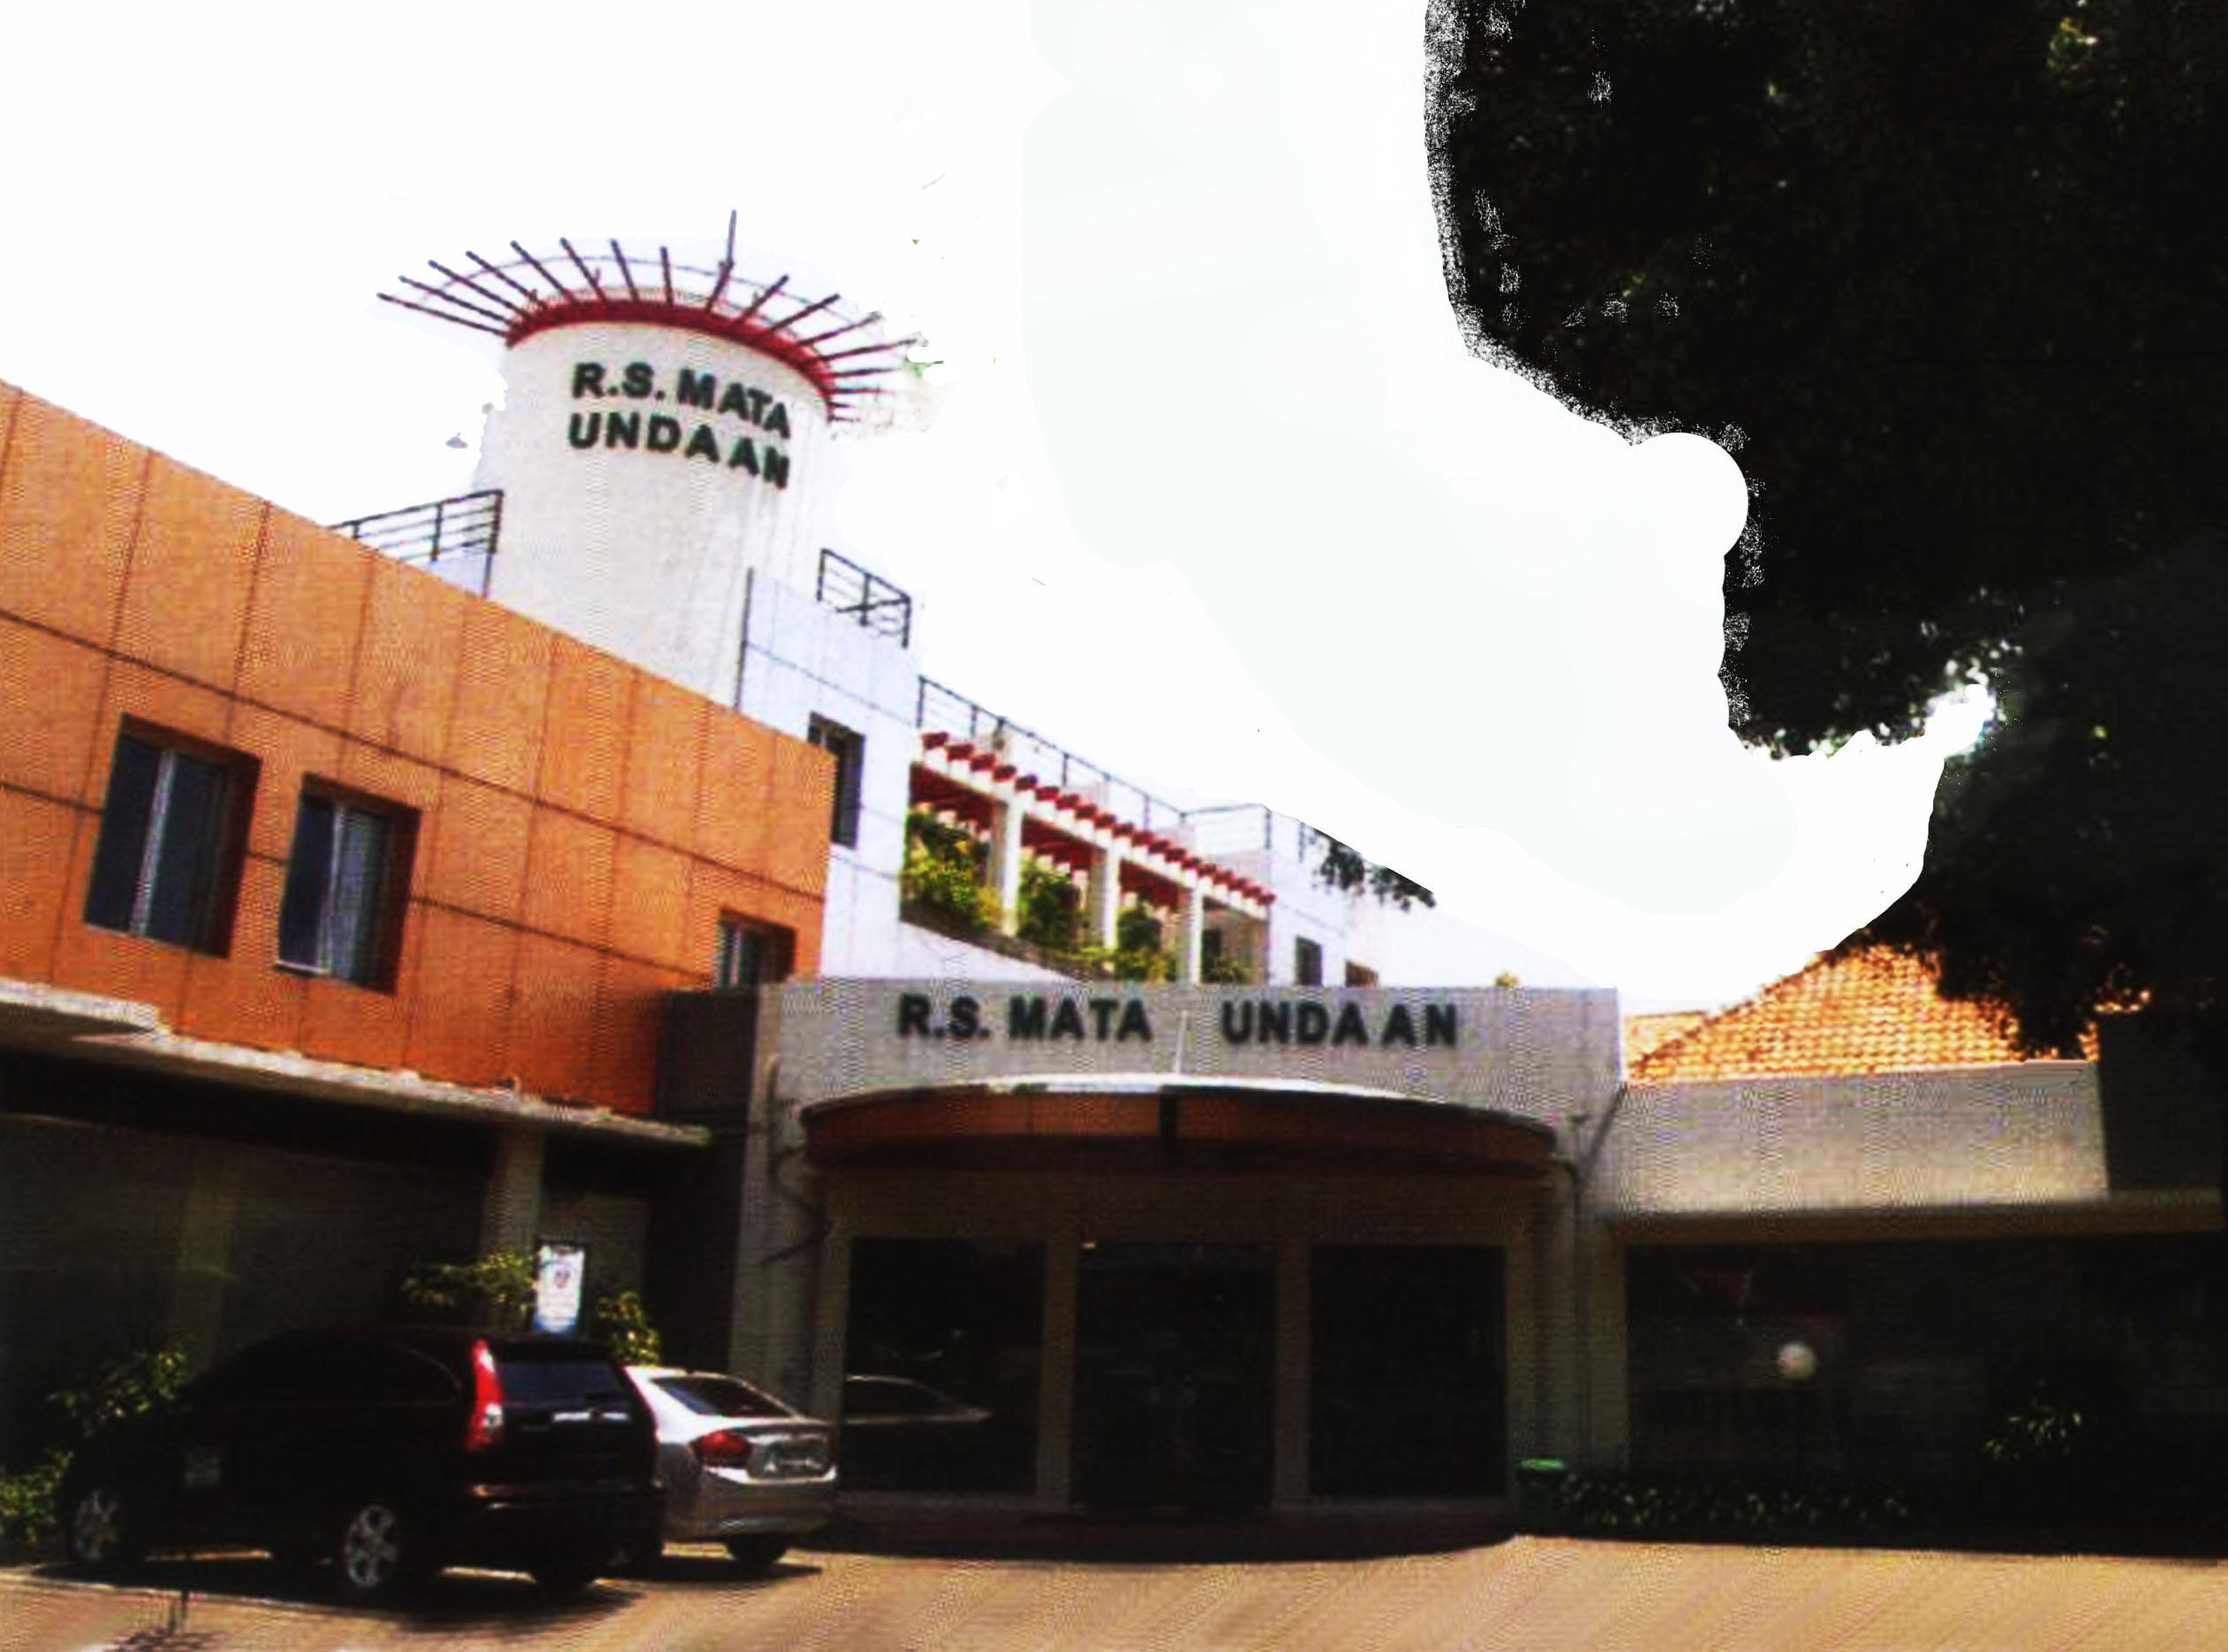 Rumah Sakit Mata Undaan Surabaya Pusaka Jawatimuran Taman Buah Kota